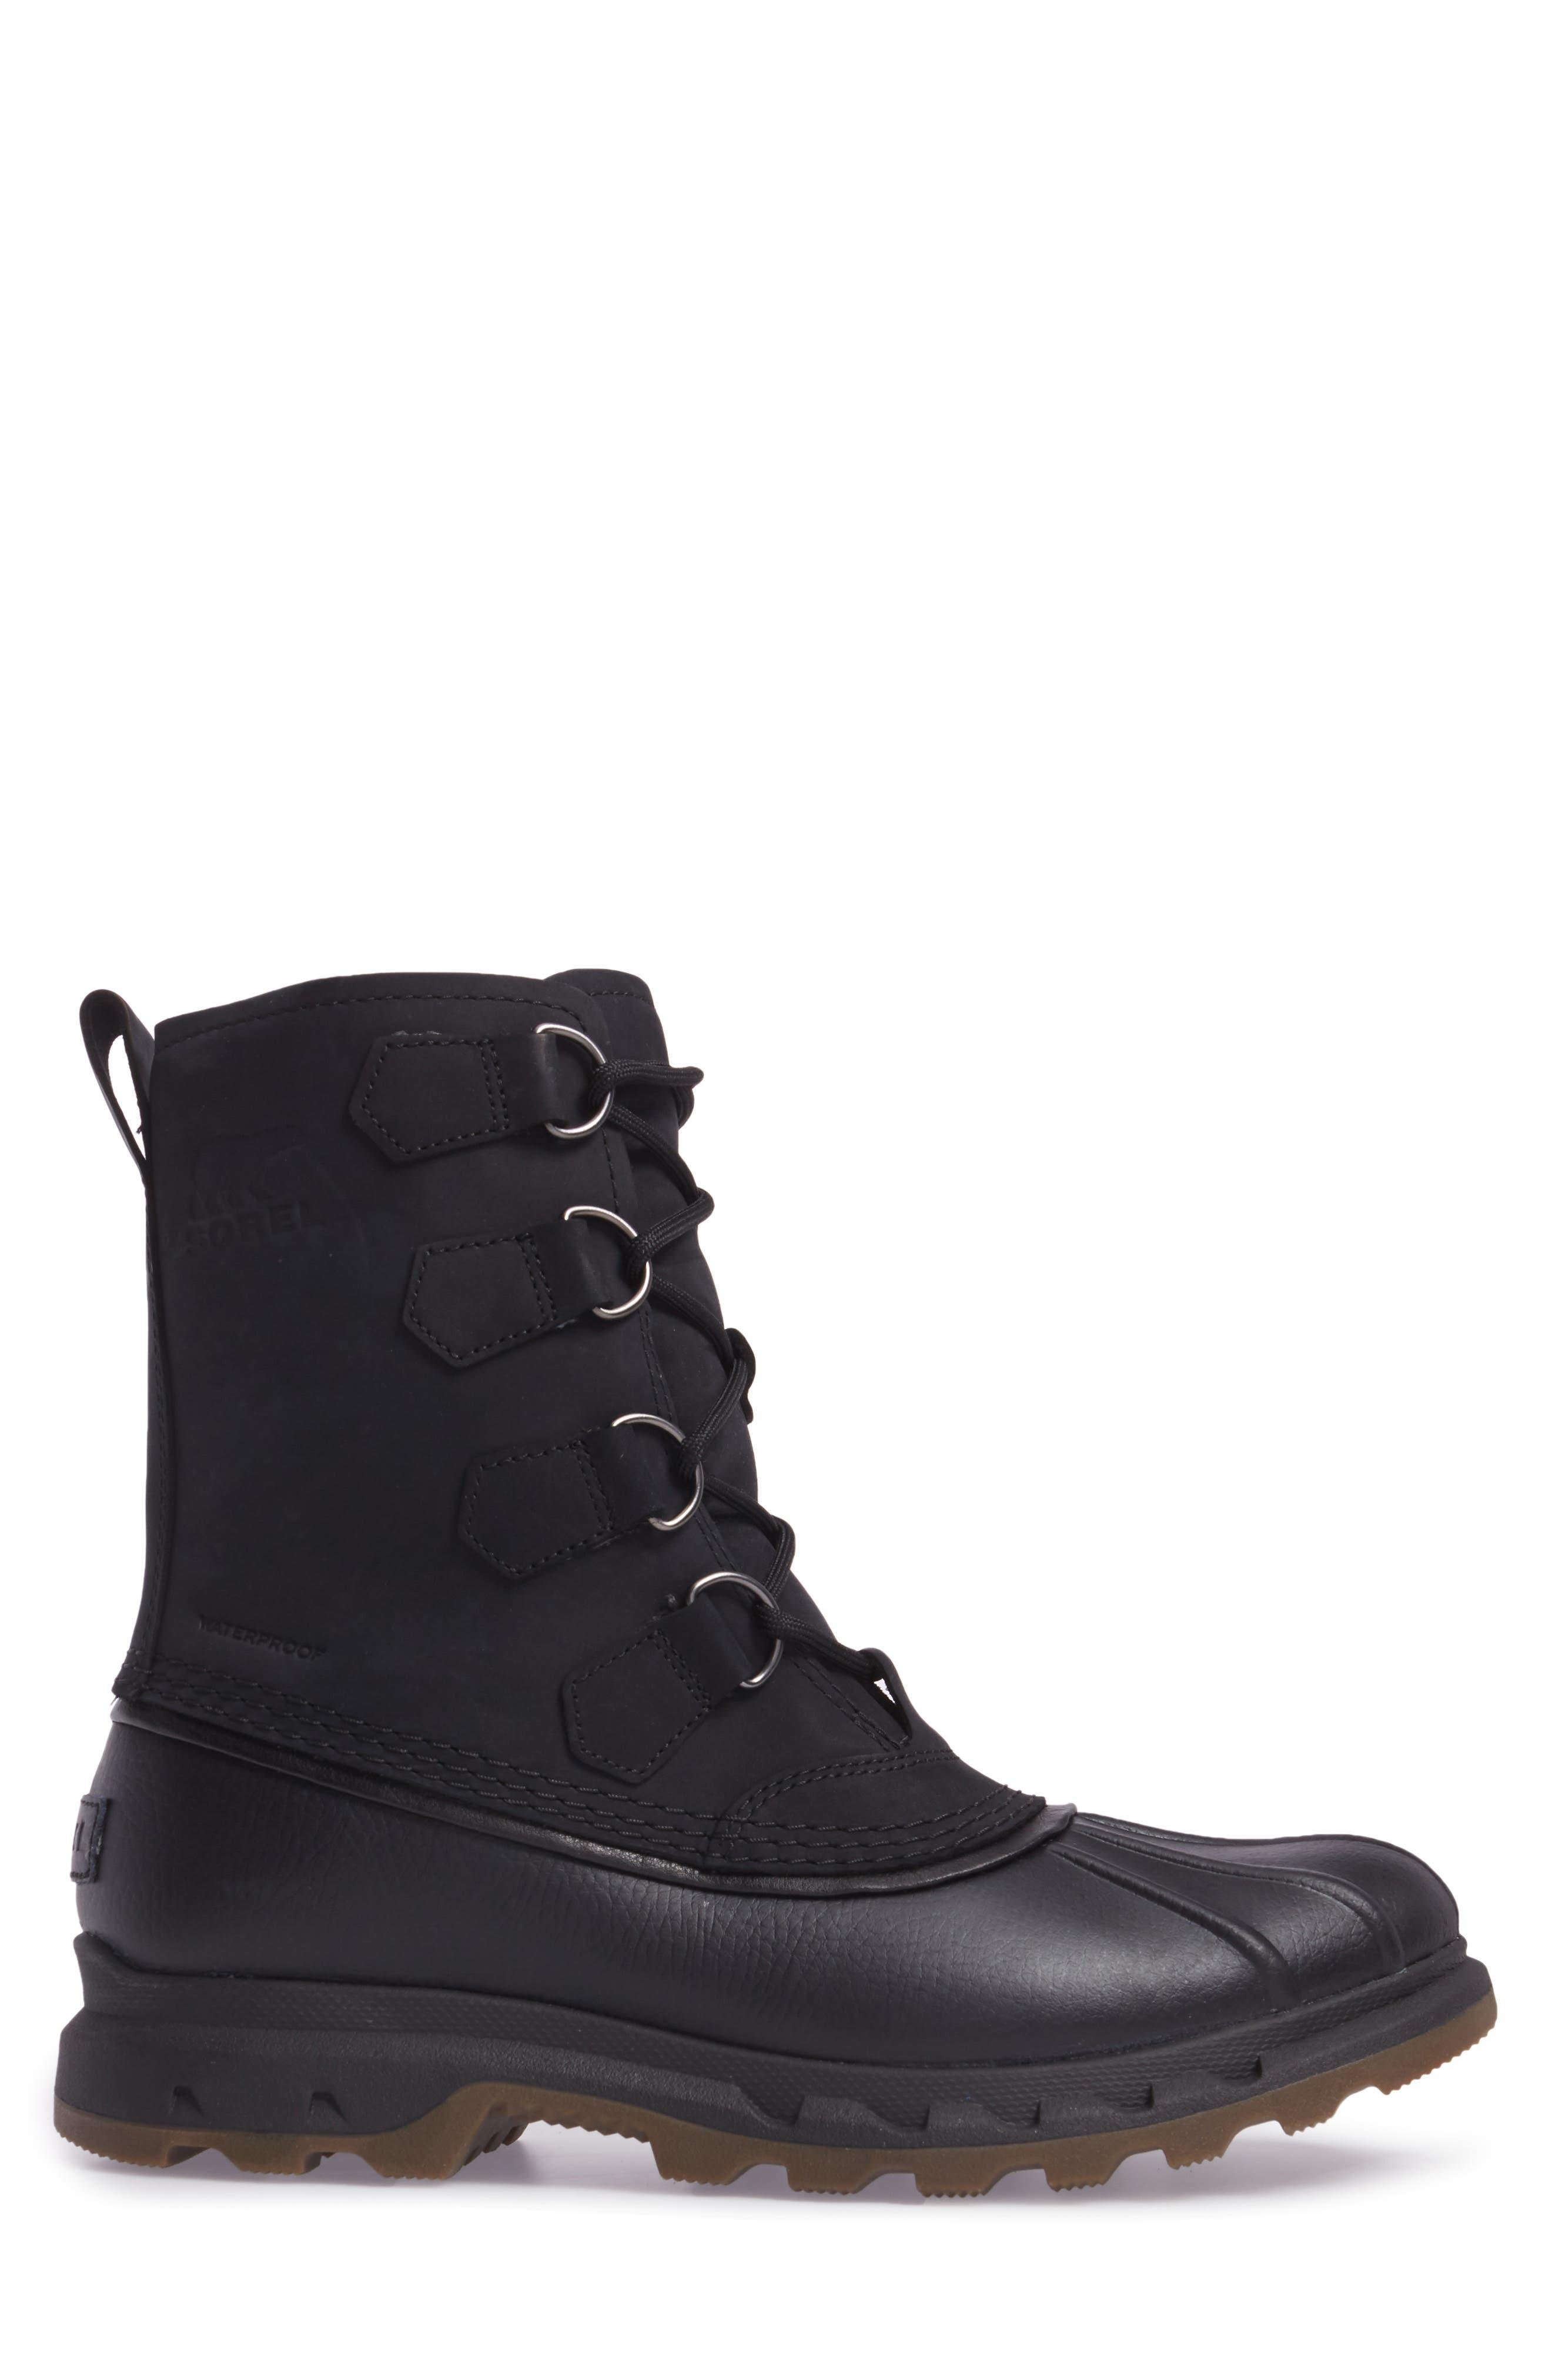 Alternate Image 3  - Sorel Portzman Classic Rain Boot (Men)